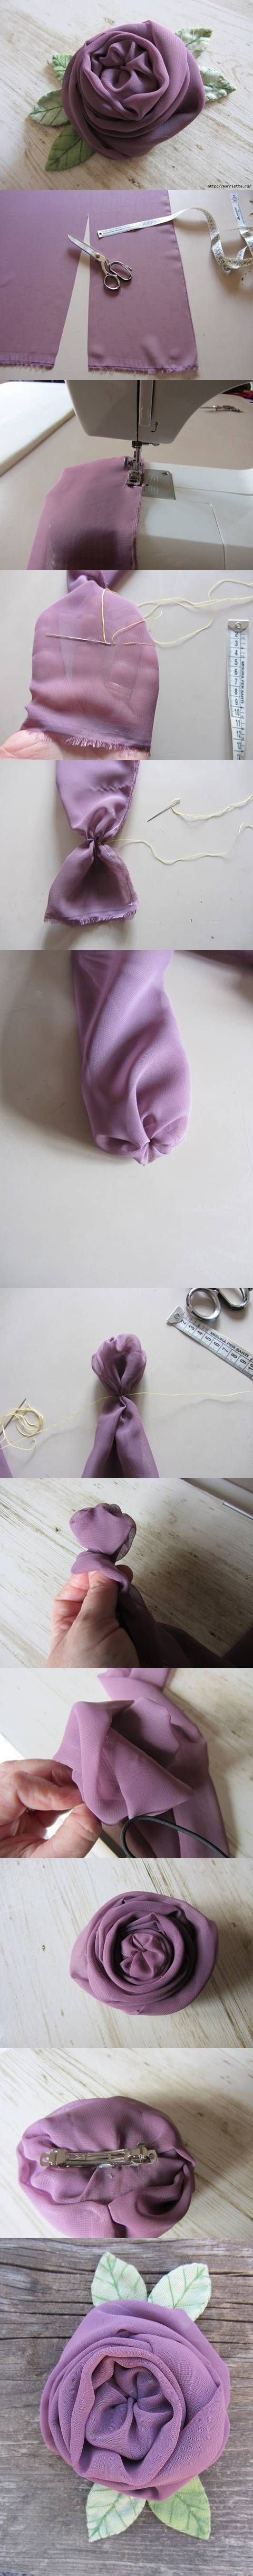 DIY Chiffon English Rose DIY Projects